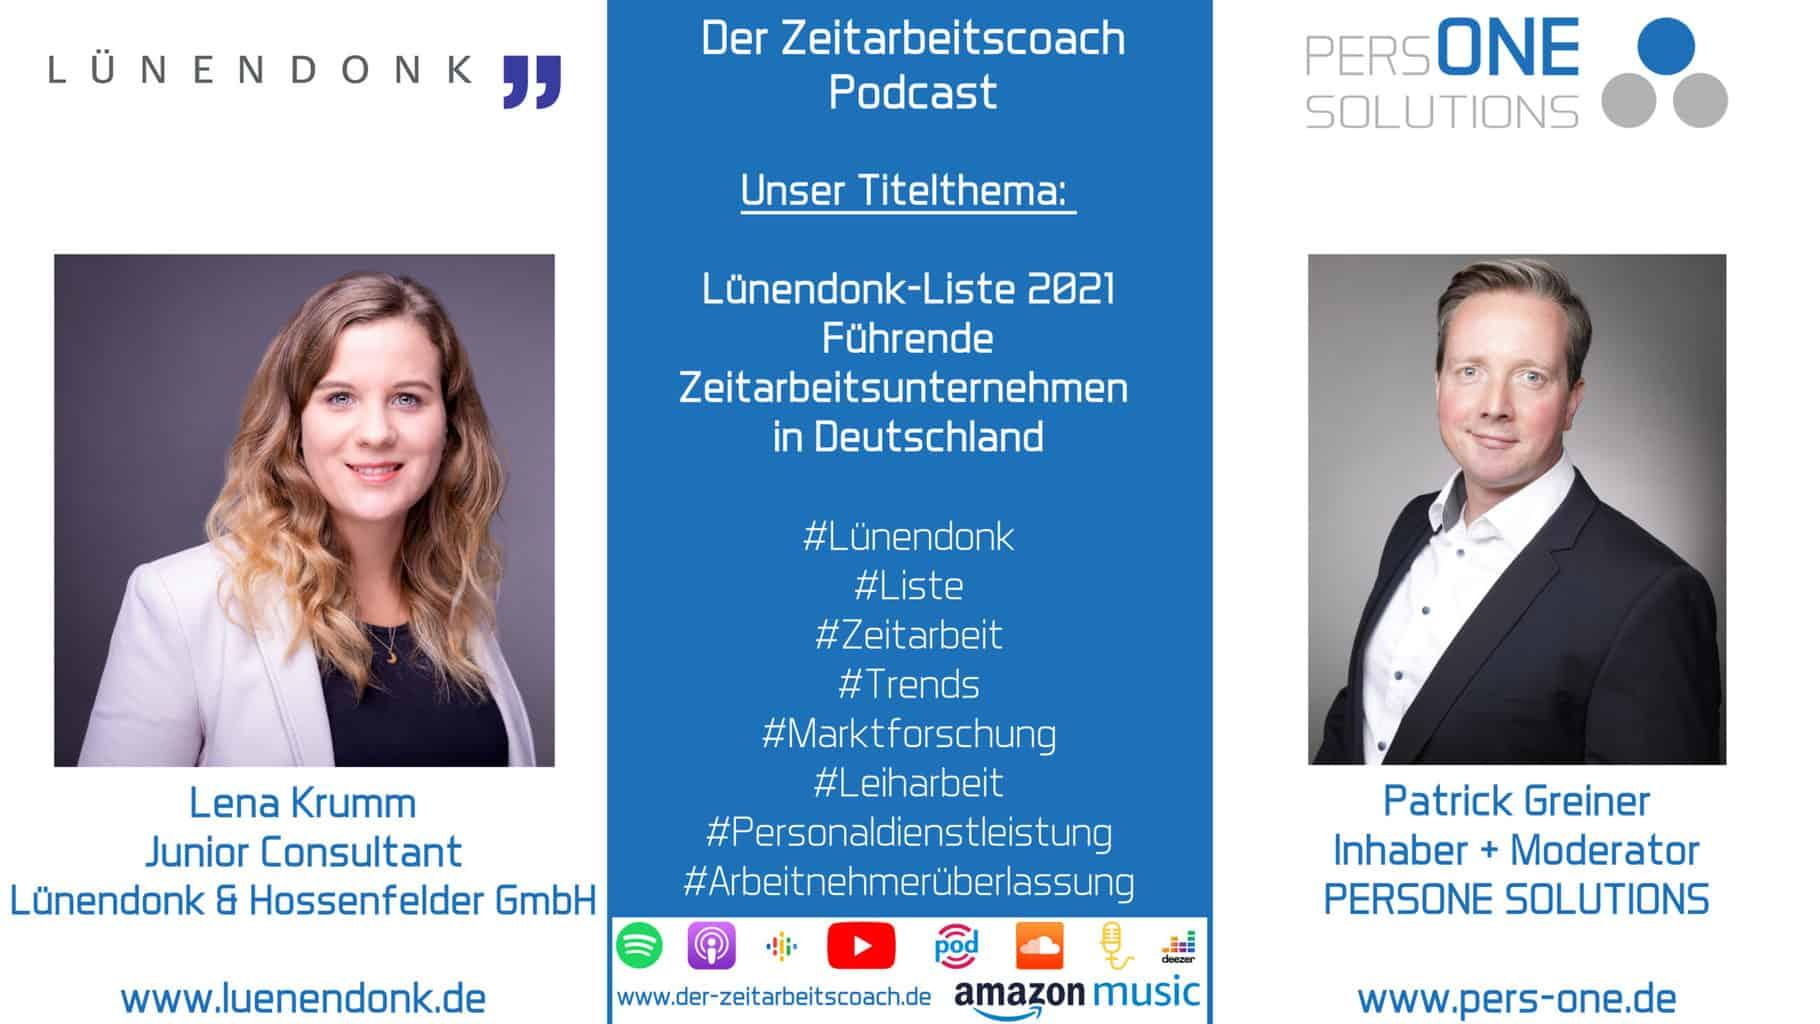 Lünendonk_Podcast SM Grafik_Zeitarbeitscoach Podcast